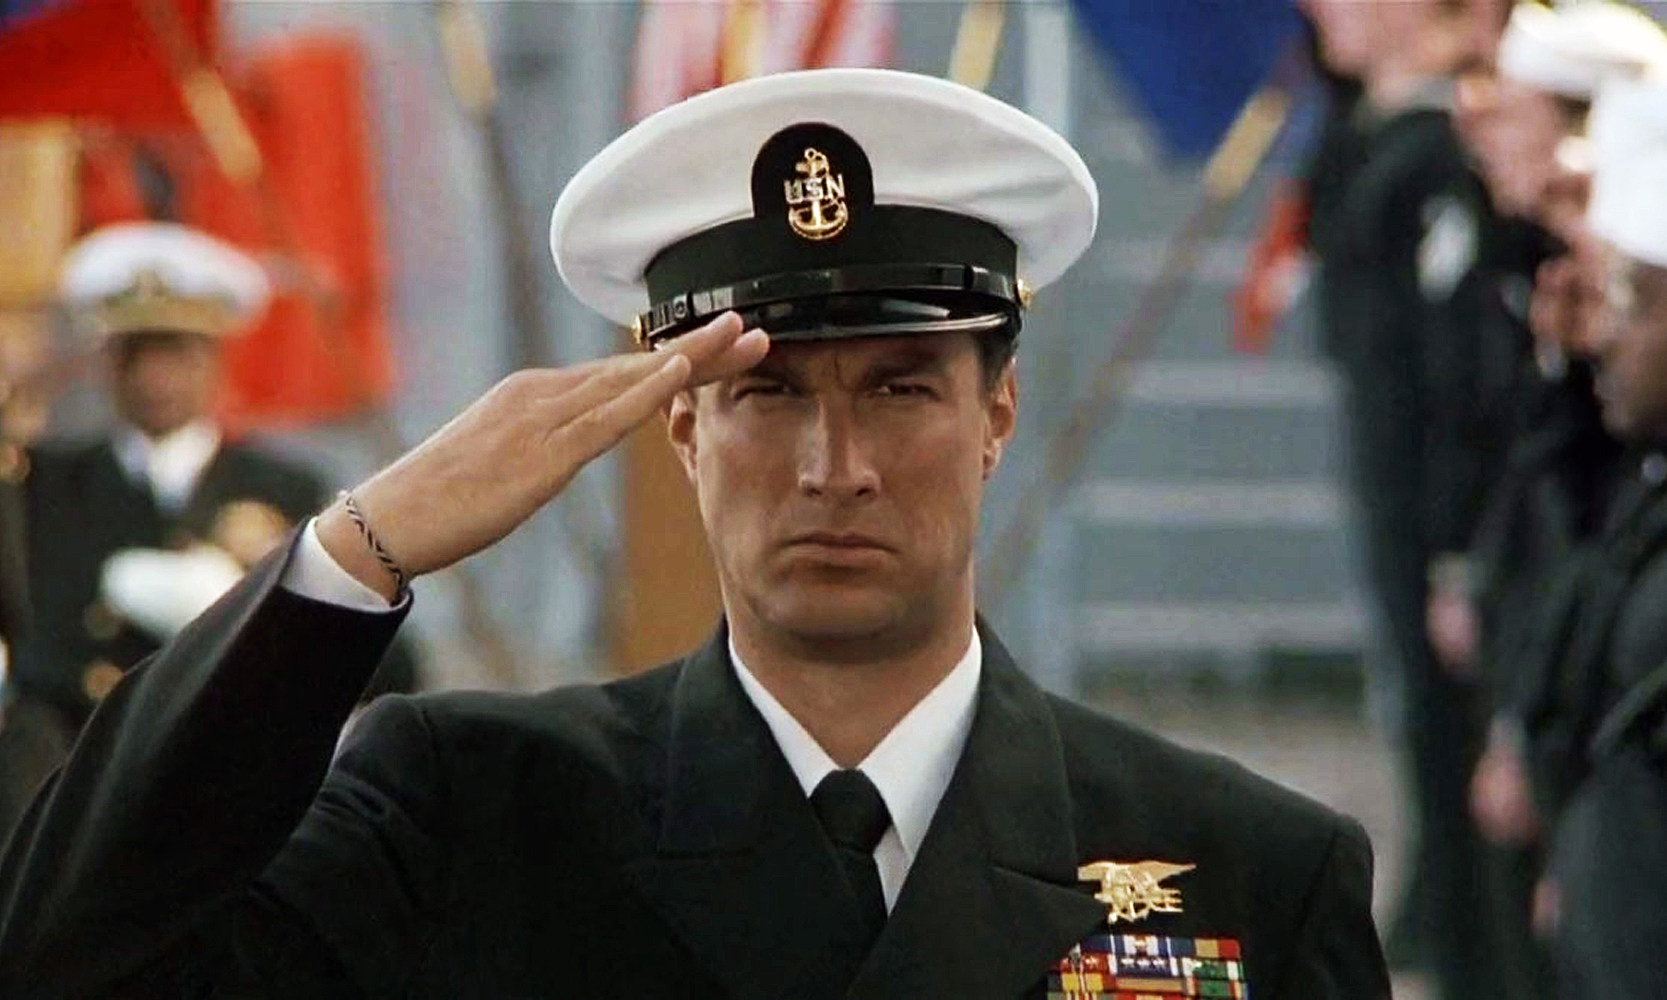 Steven-Seagal-Under-Siege-salute.jpg